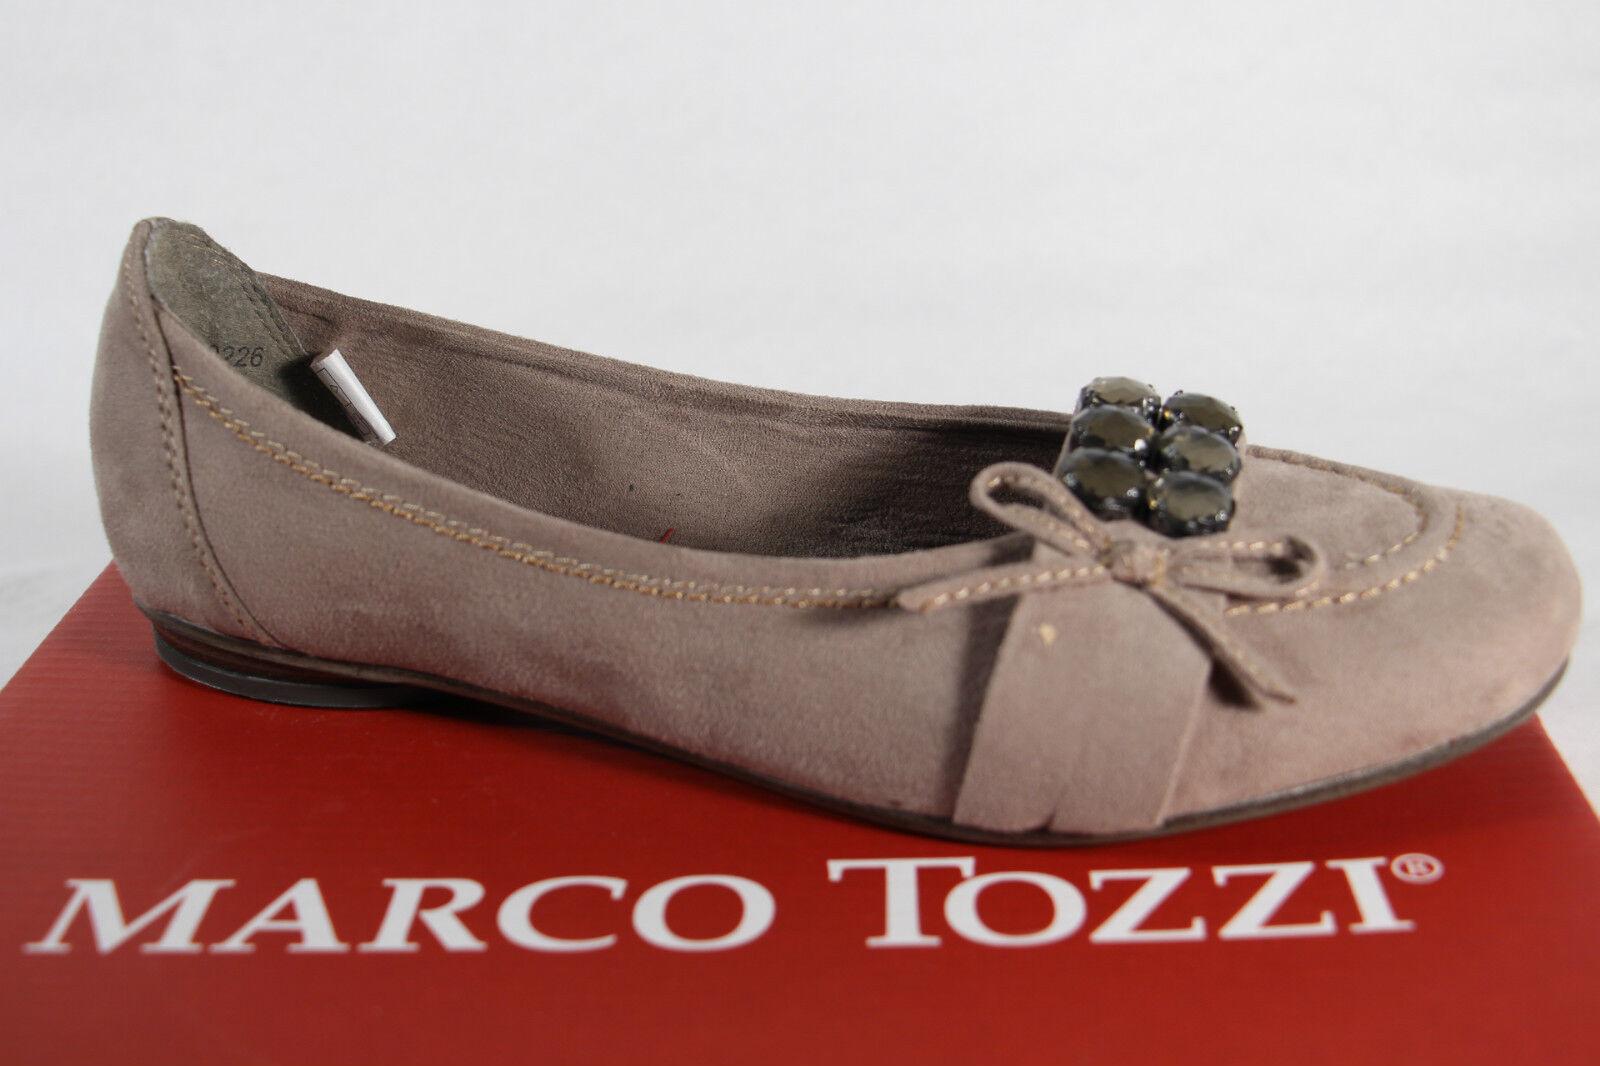 Marco Tozzi Court Shoes Ballerina Slippers Beige Soft Inner Sole EUR ... 0434de57cb